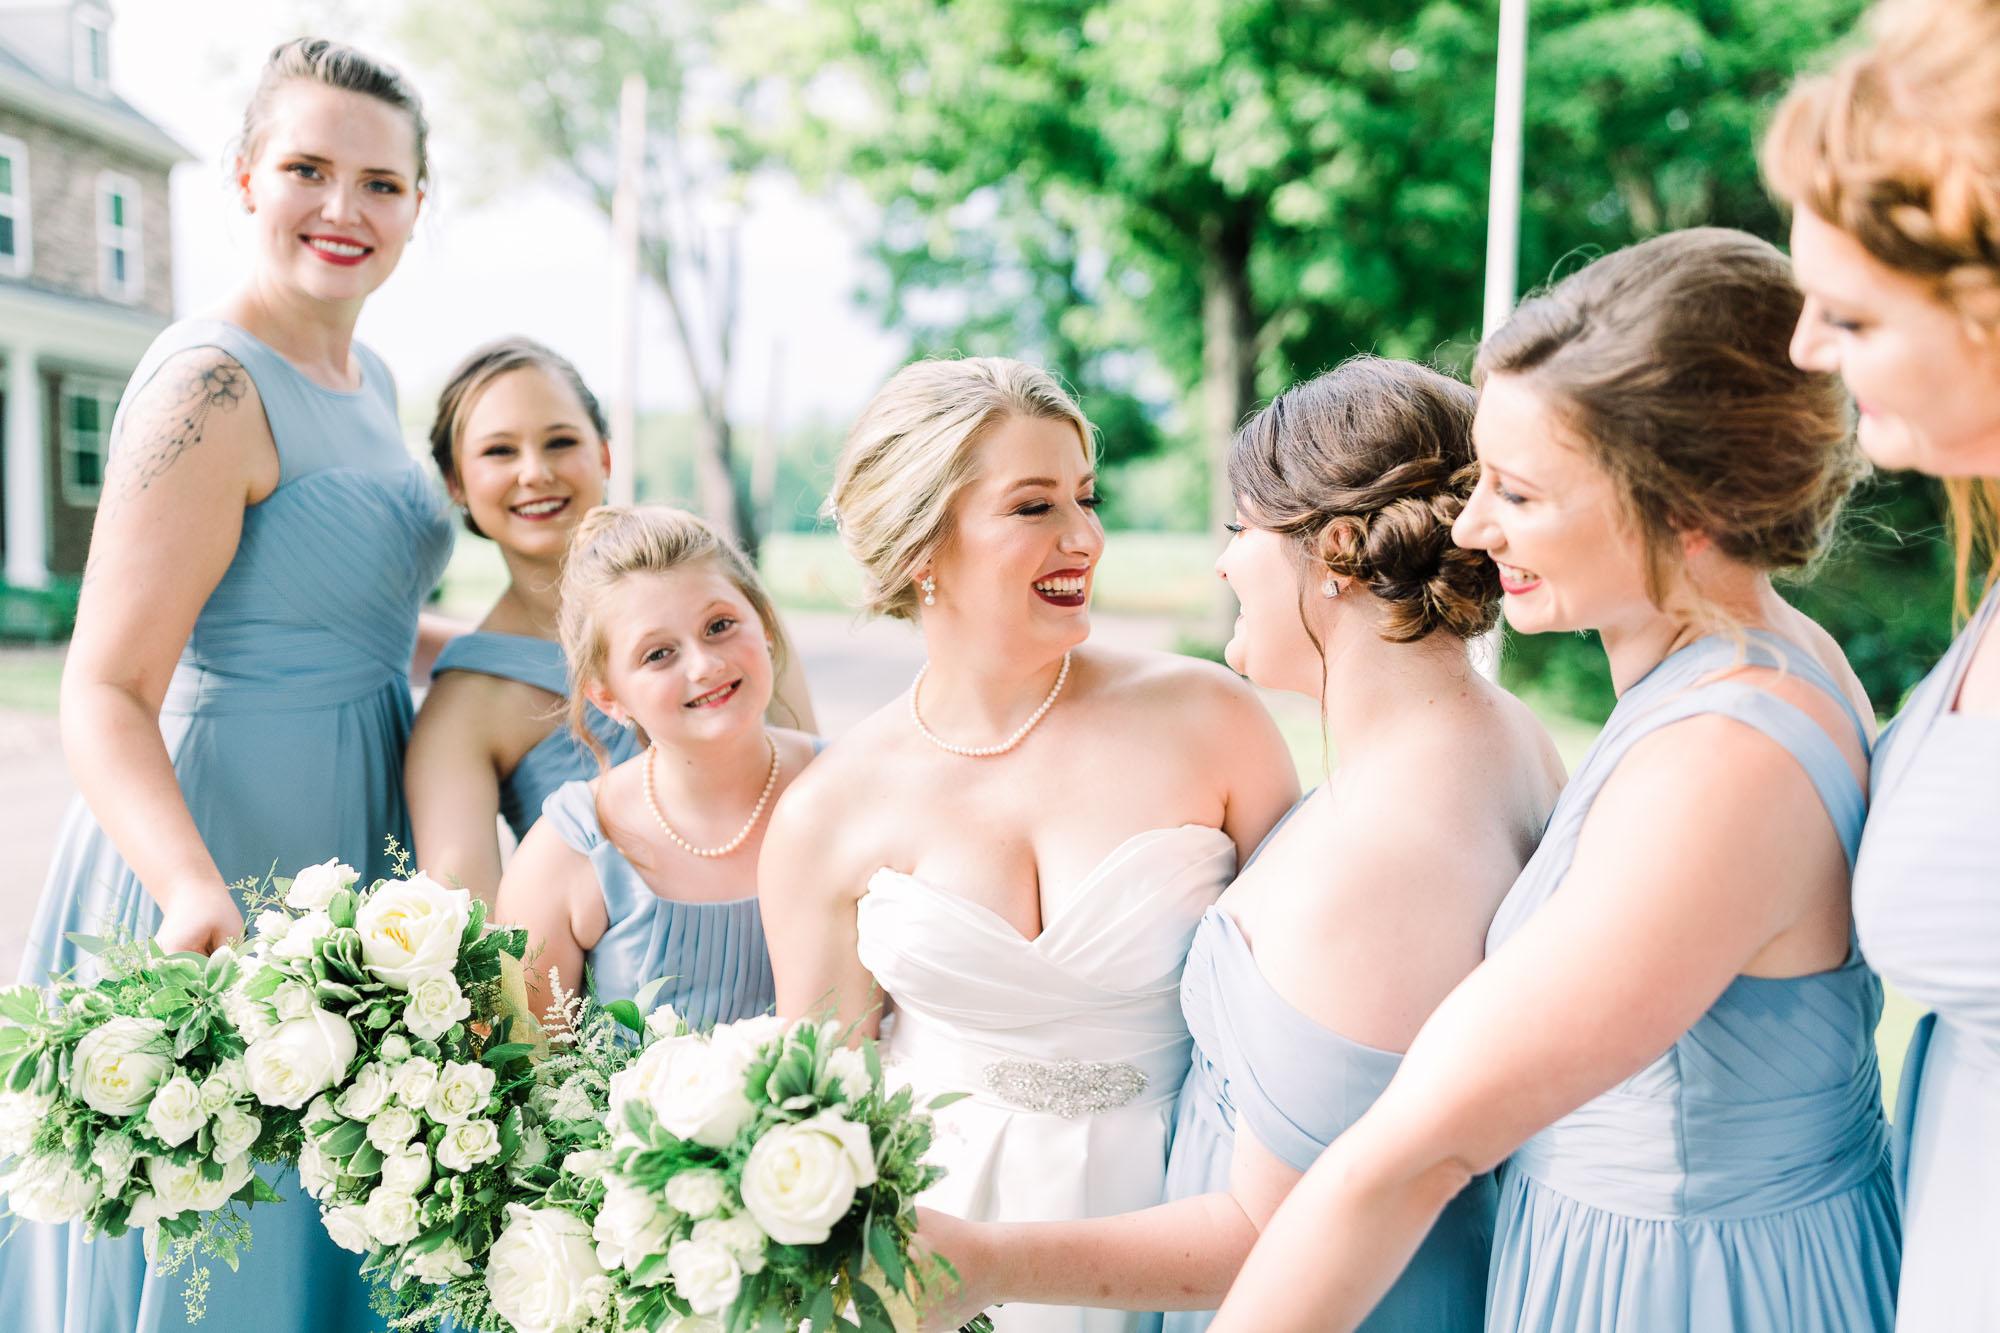 isle-of-que-wedding-6899.jpg